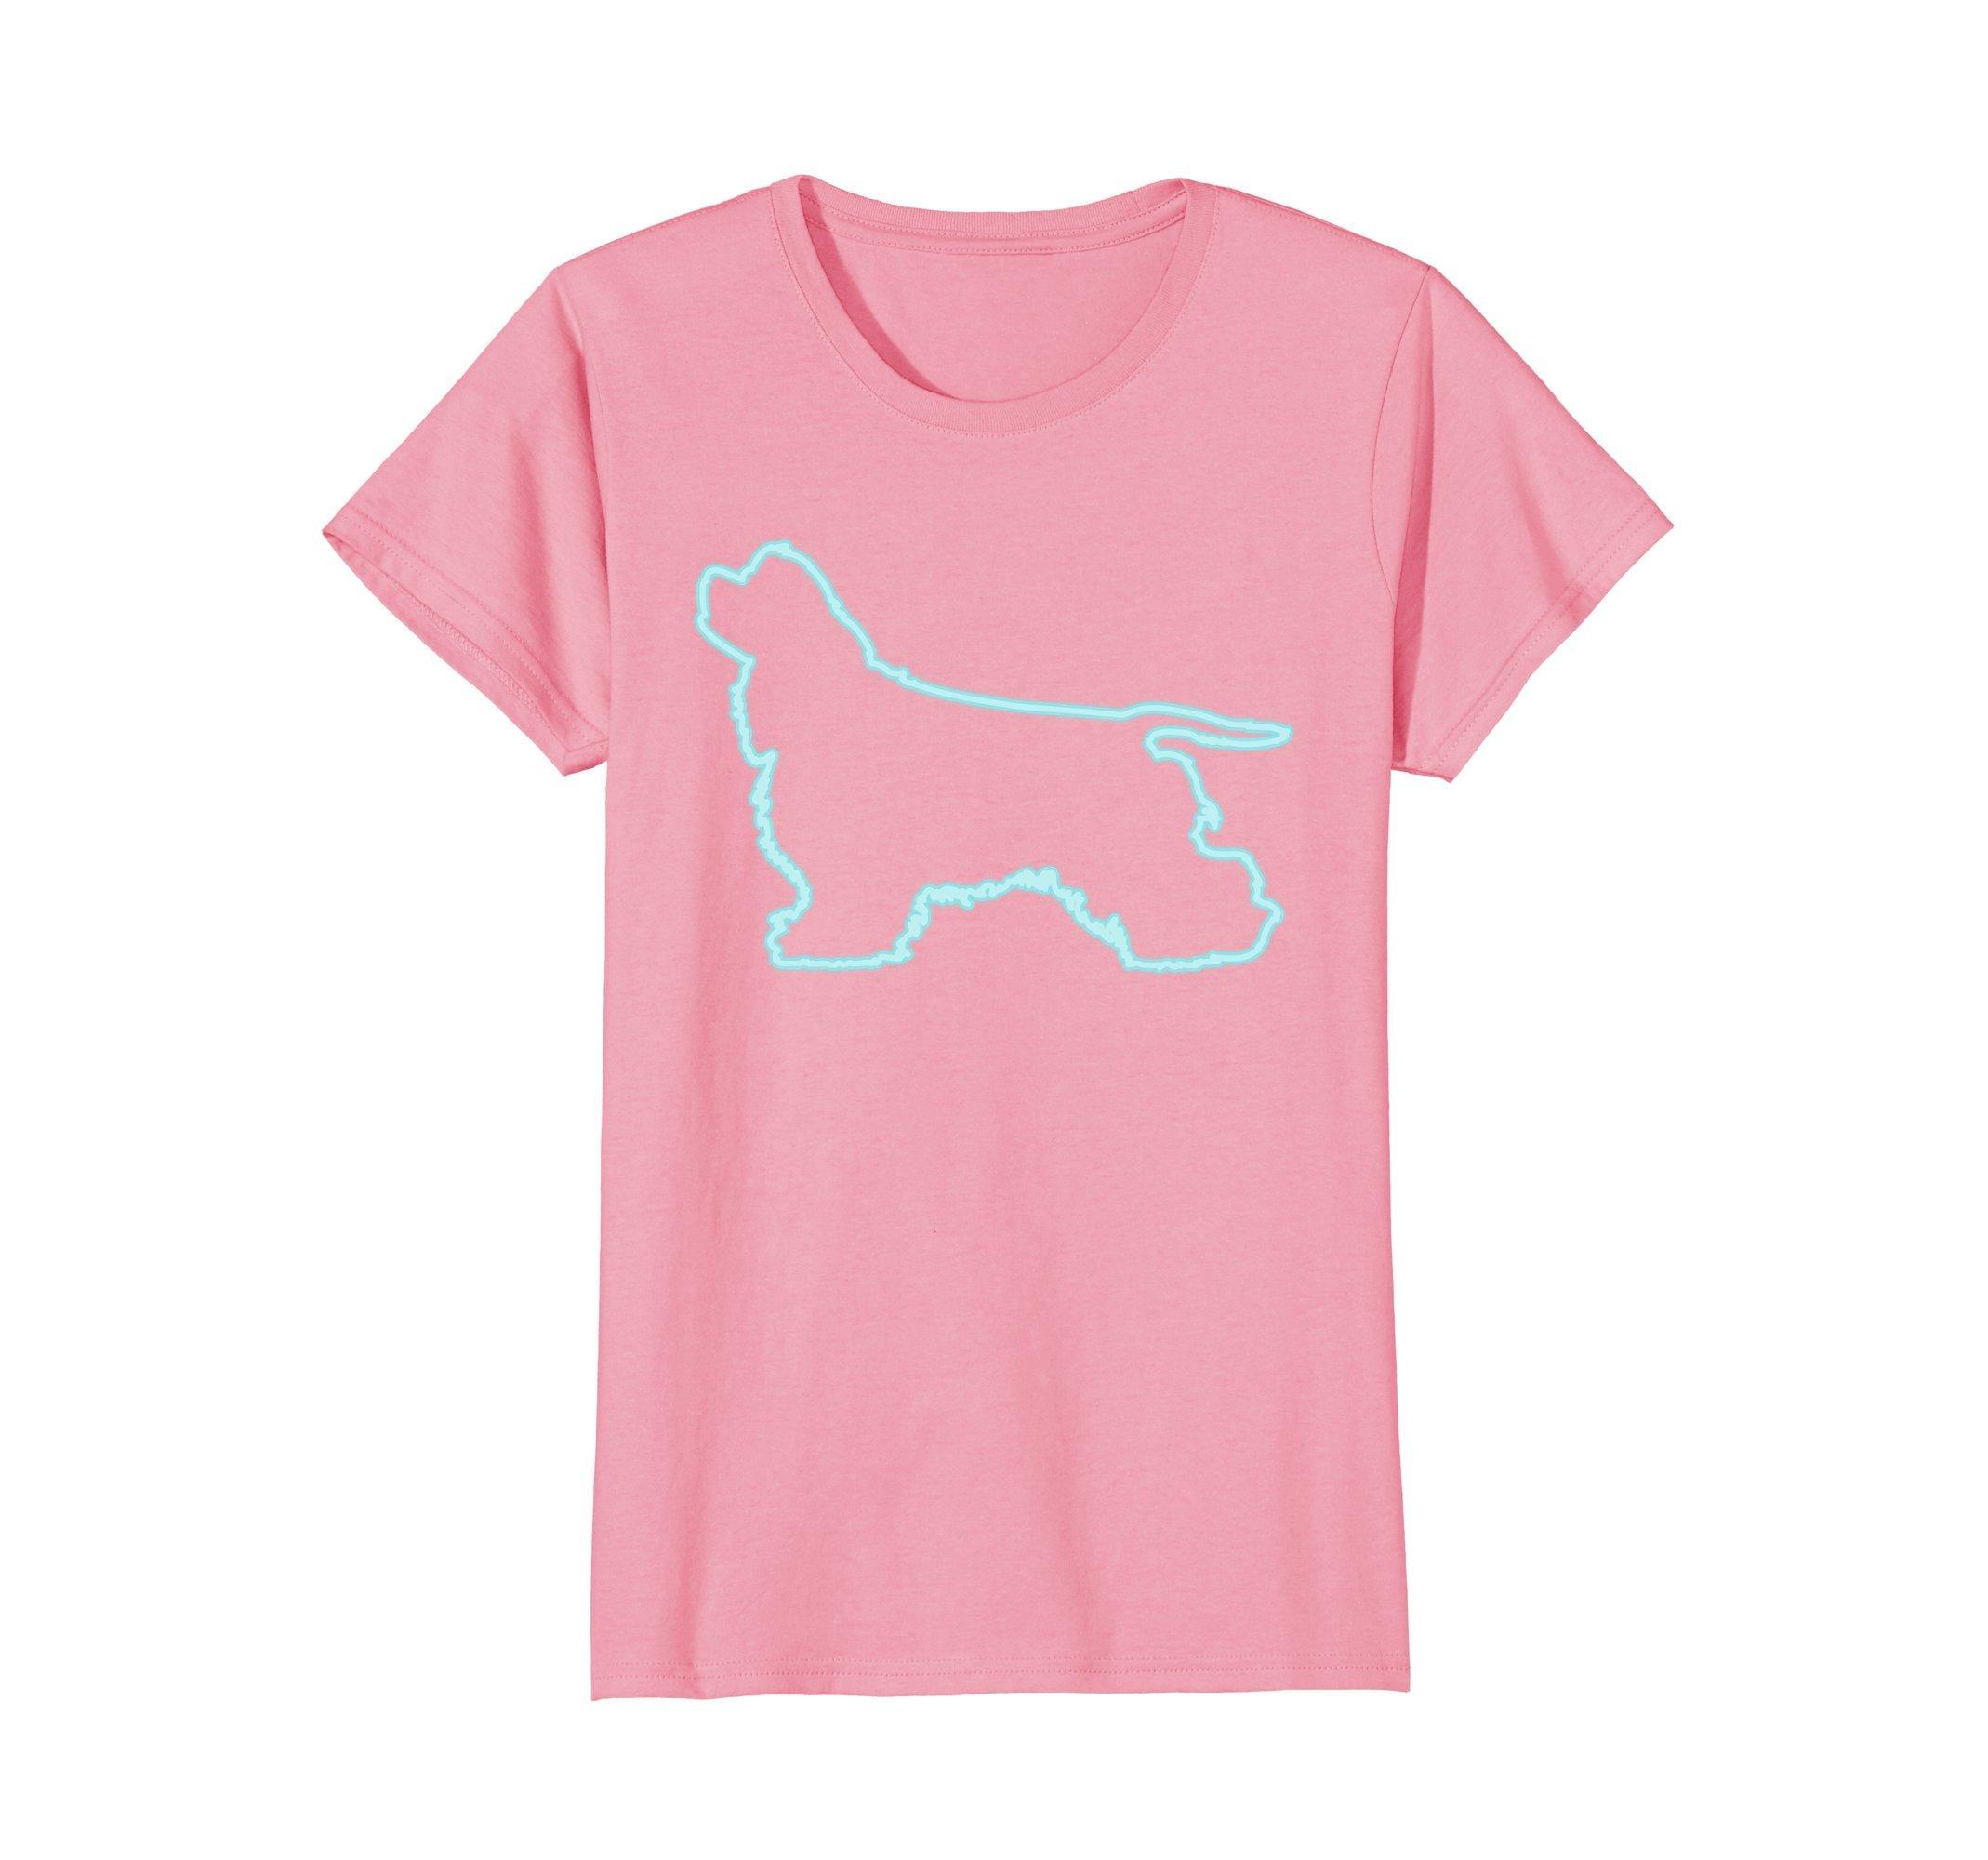 Womens 80s Retro Neon Sign Dog Cocker Spaniel T-Shirt. 80's Gift Small Pink